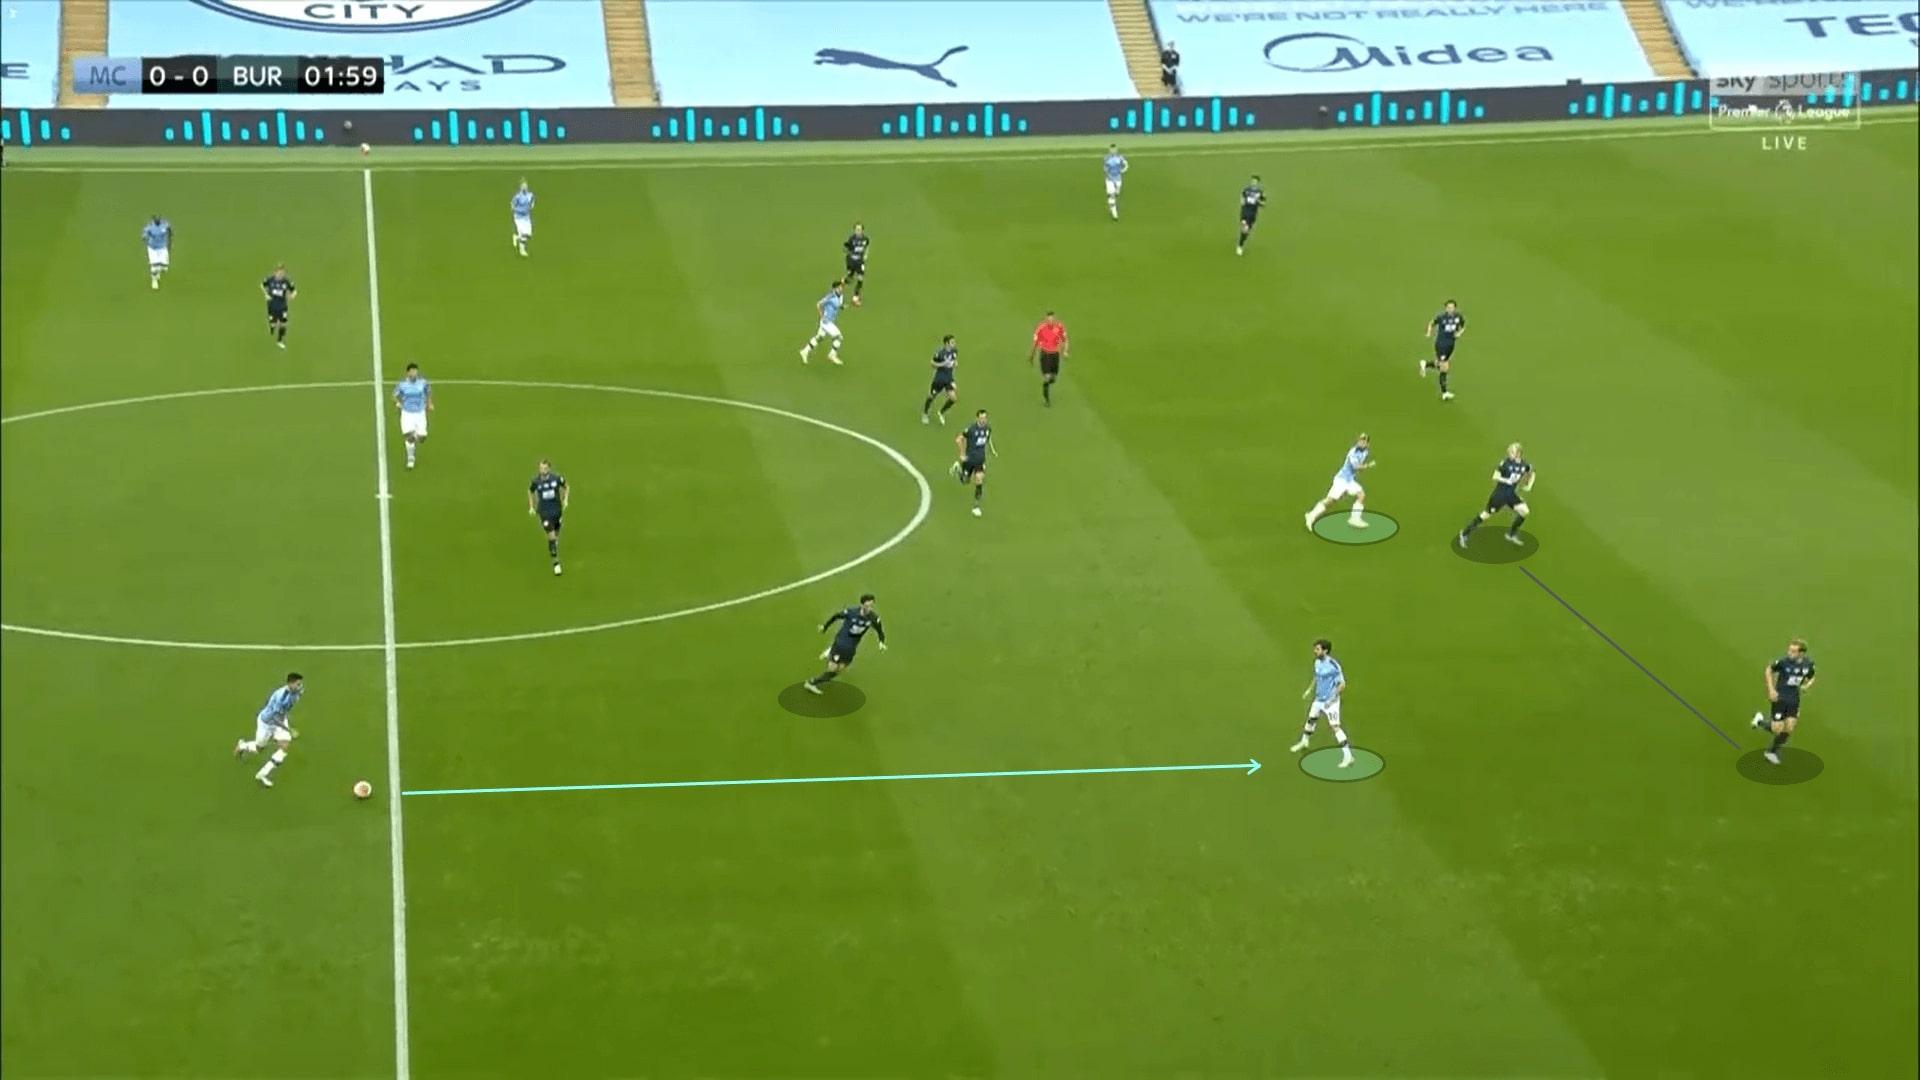 Premier League 2019/20: Manchester City vs Burnley - tactical analysis tactics